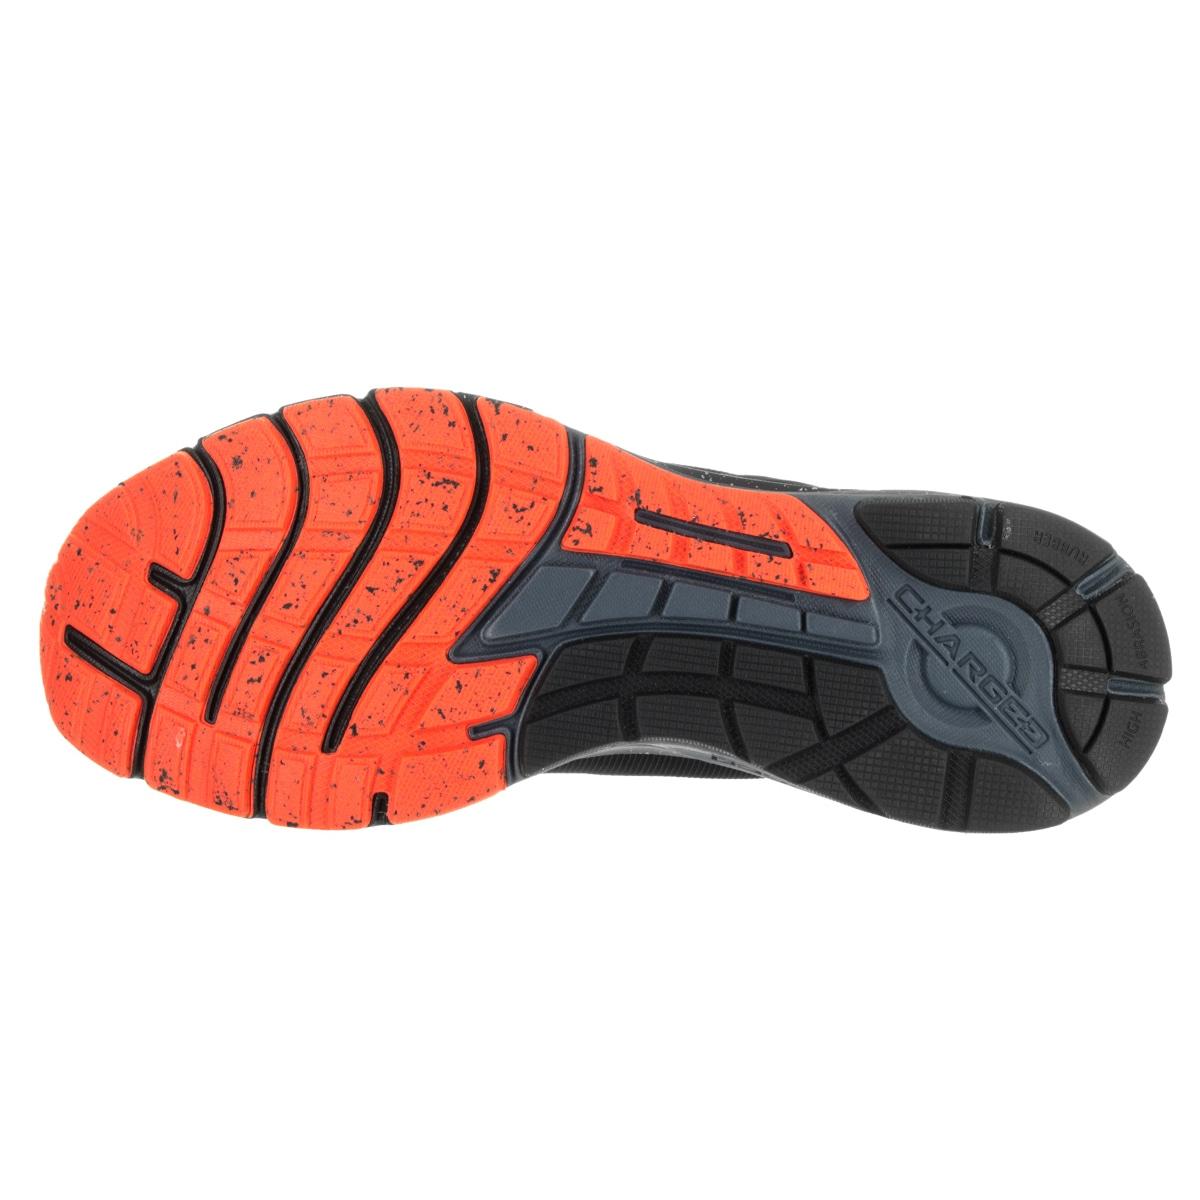 timeless design d7cc2 cc901 Under Armour Men's UA Charged Bandit 2 Night Black Textile Running Shoes